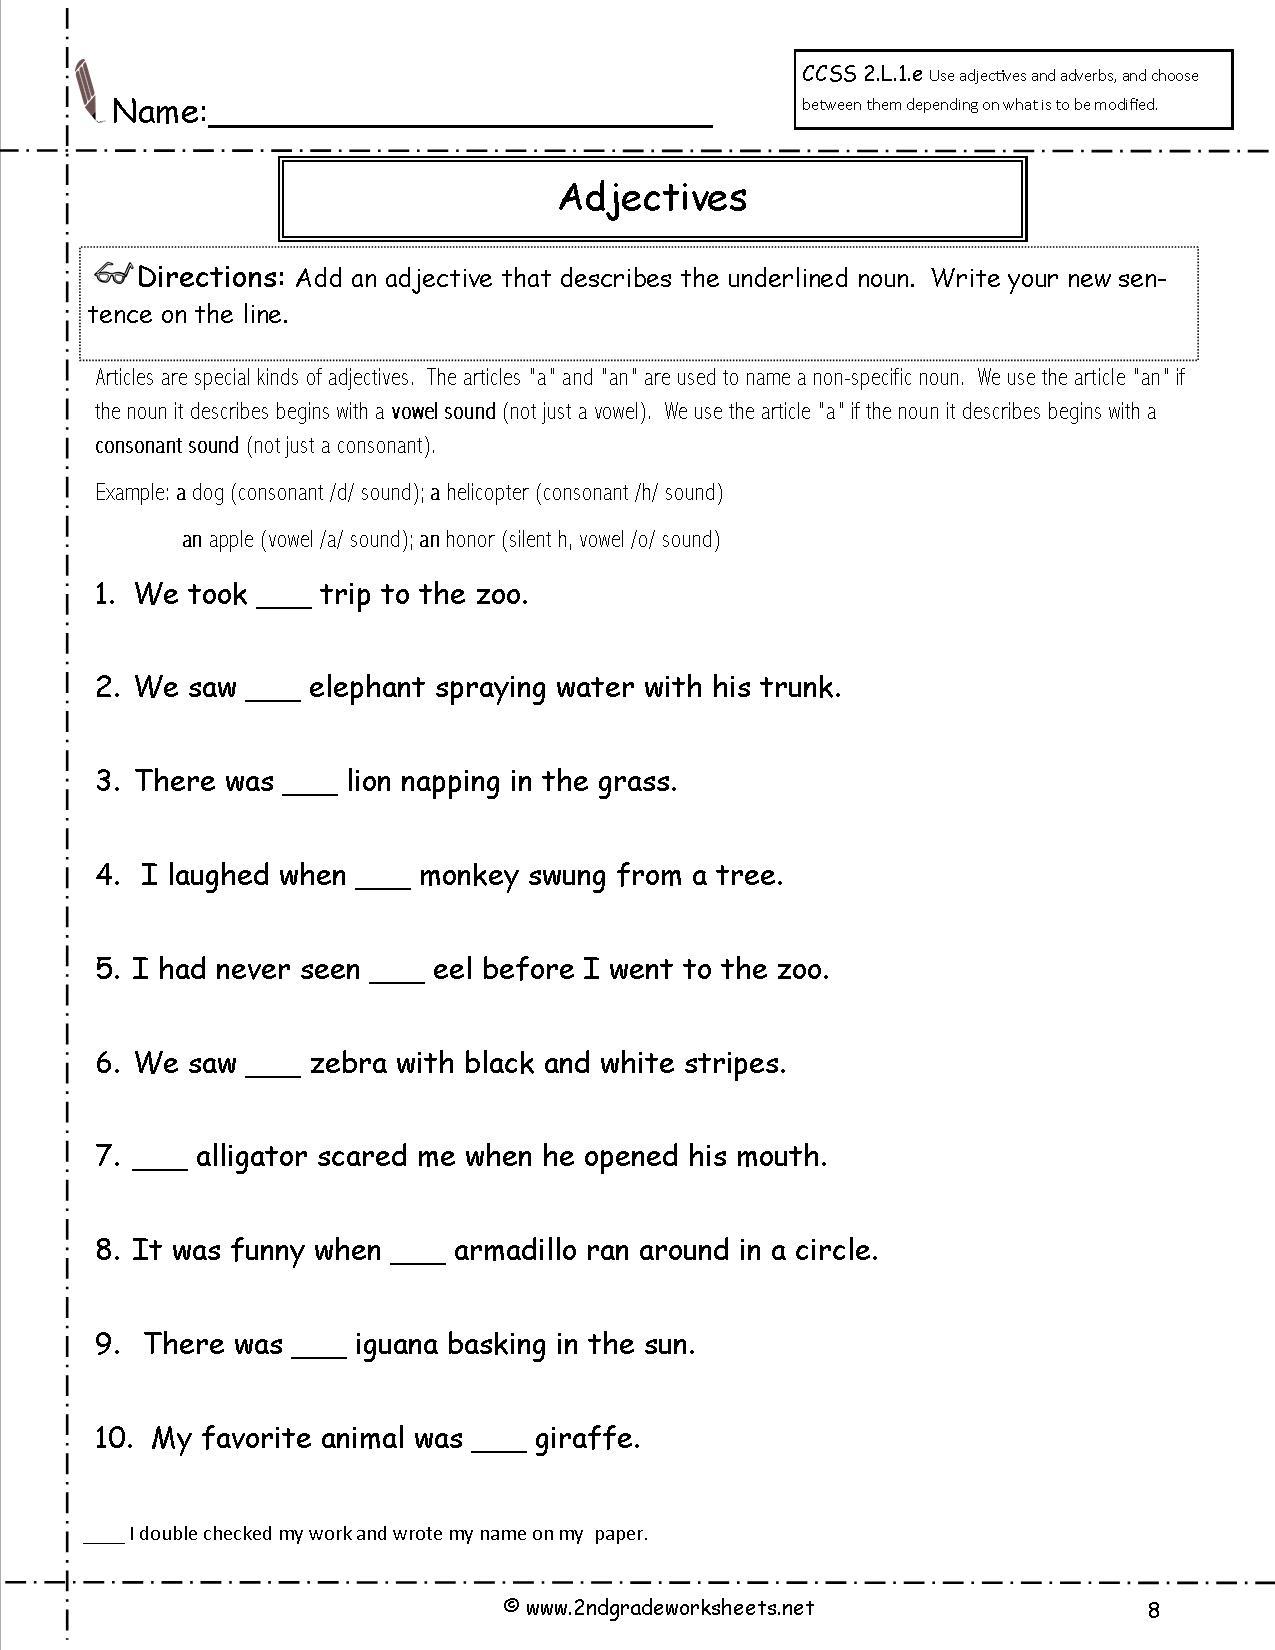 Free Language/grammar Worksheets And Printouts | Free Printable Grammar Worksheets